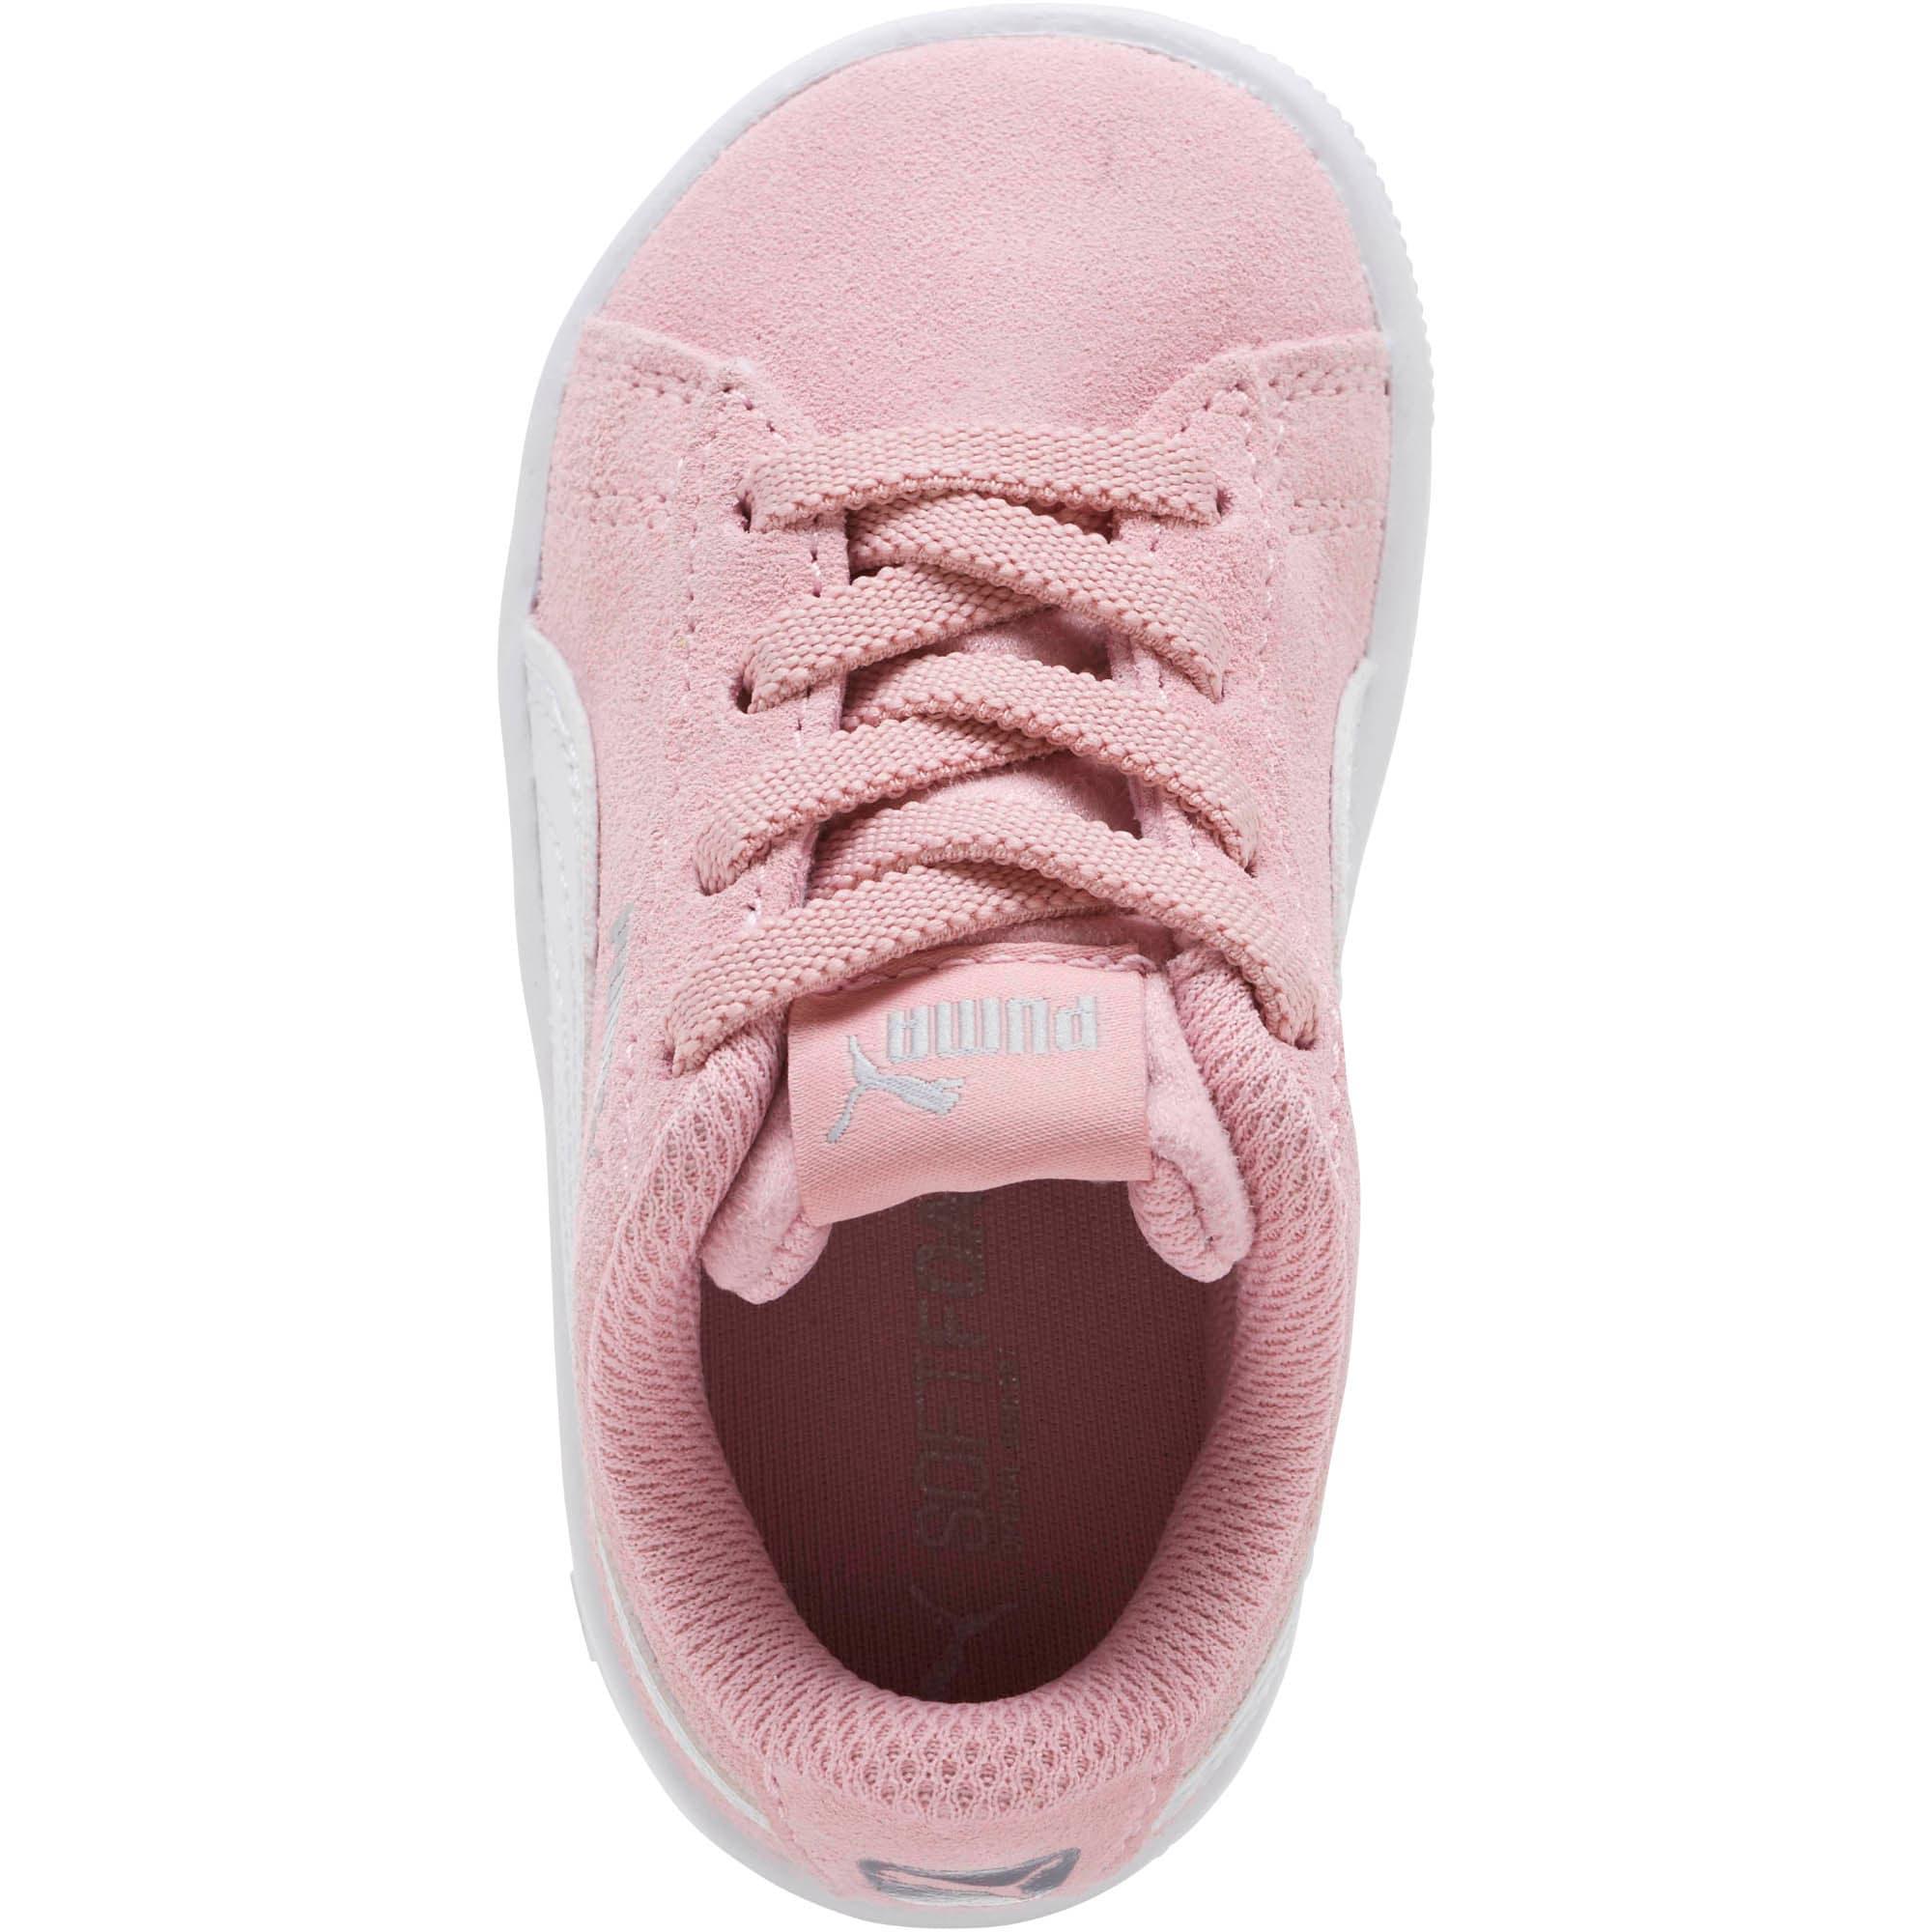 Thumbnail 5 of PUMA Vikky AC Toddler Shoes, Pale Pink-Puma White, medium